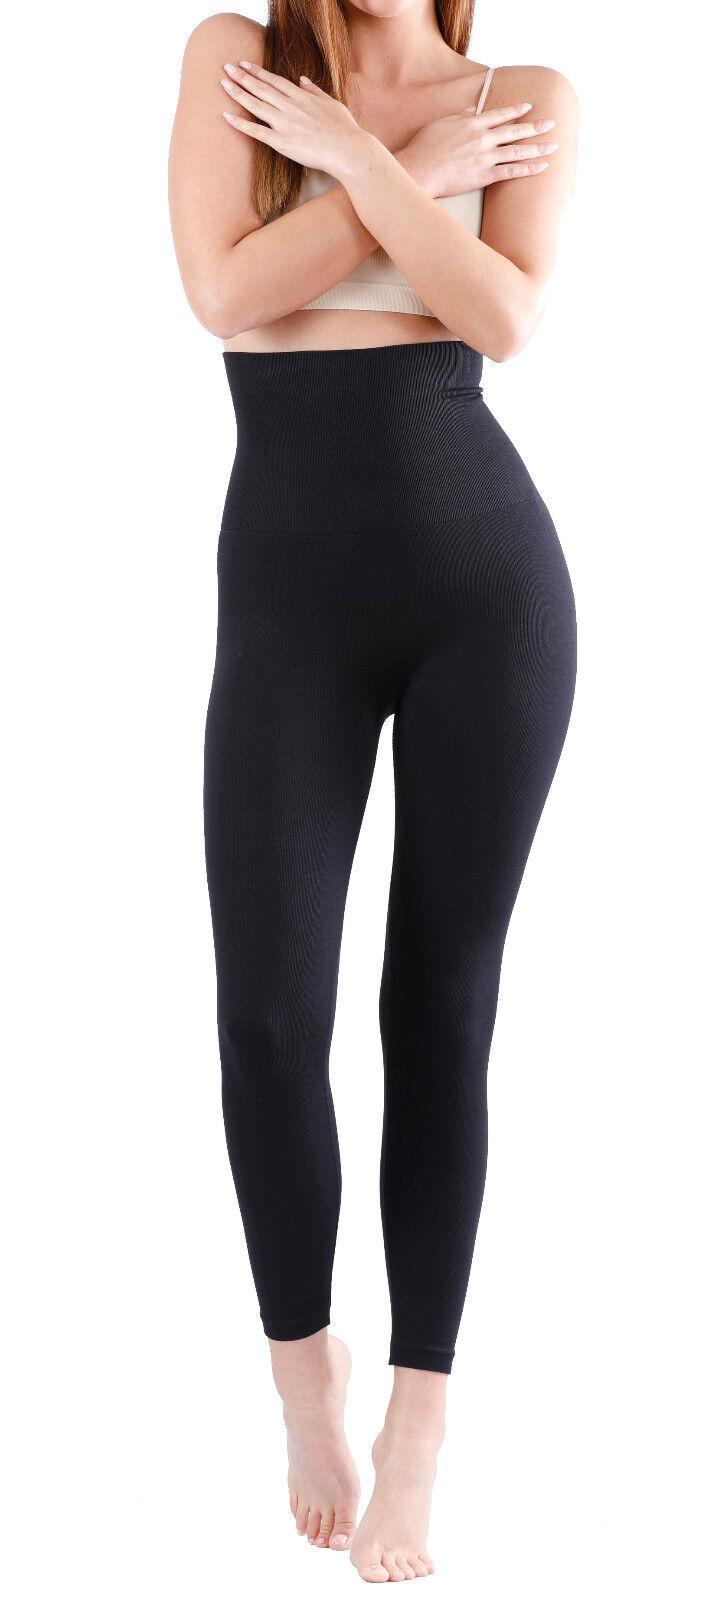 Damen Slim Leggings Shapewear-Form Leggings Bauch Weg-Damen Hose Schwarz